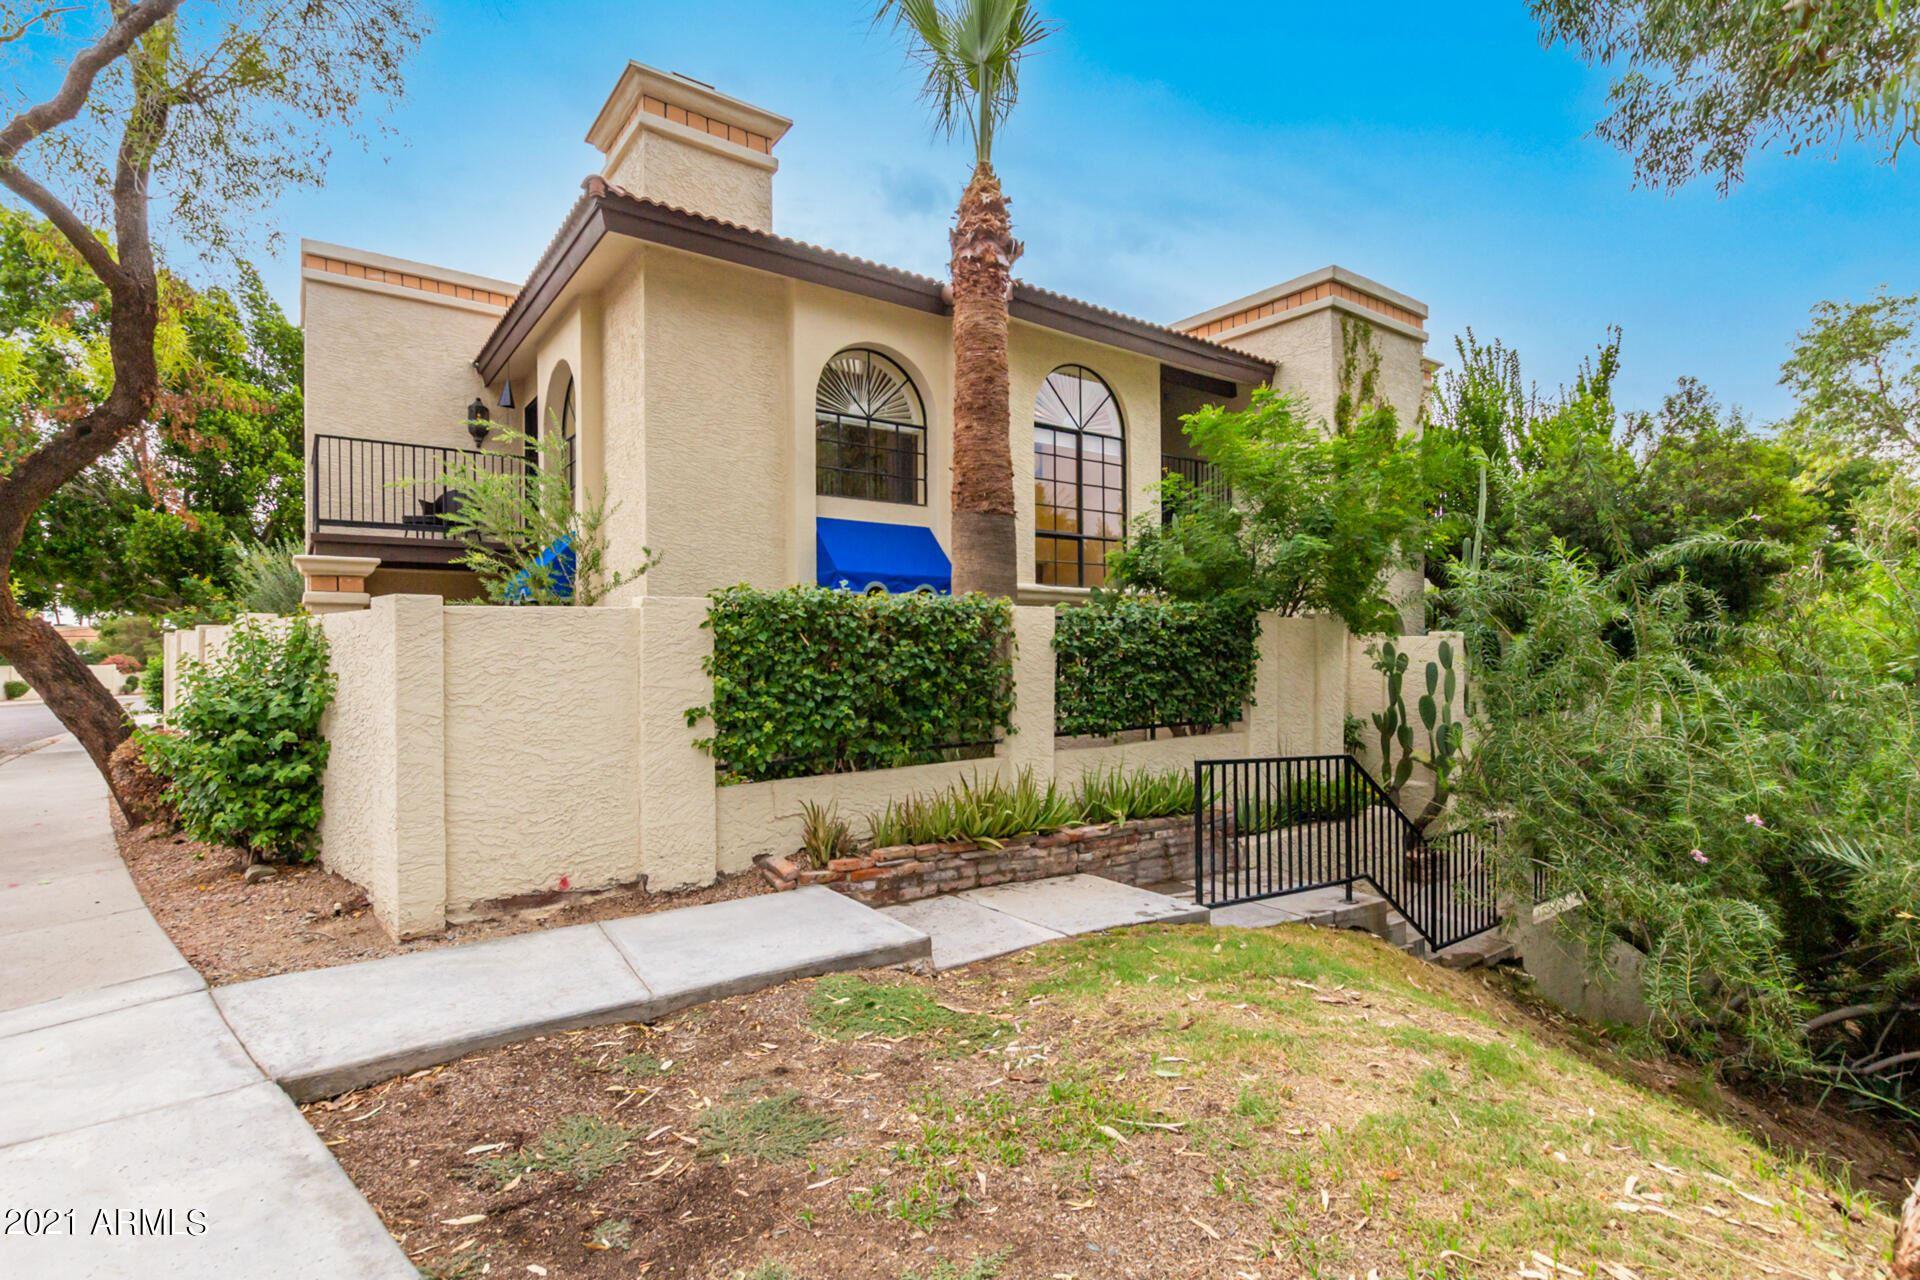 8865 S 48TH Street #1, Phoenix, AZ 85044 - MLS#: 6298960